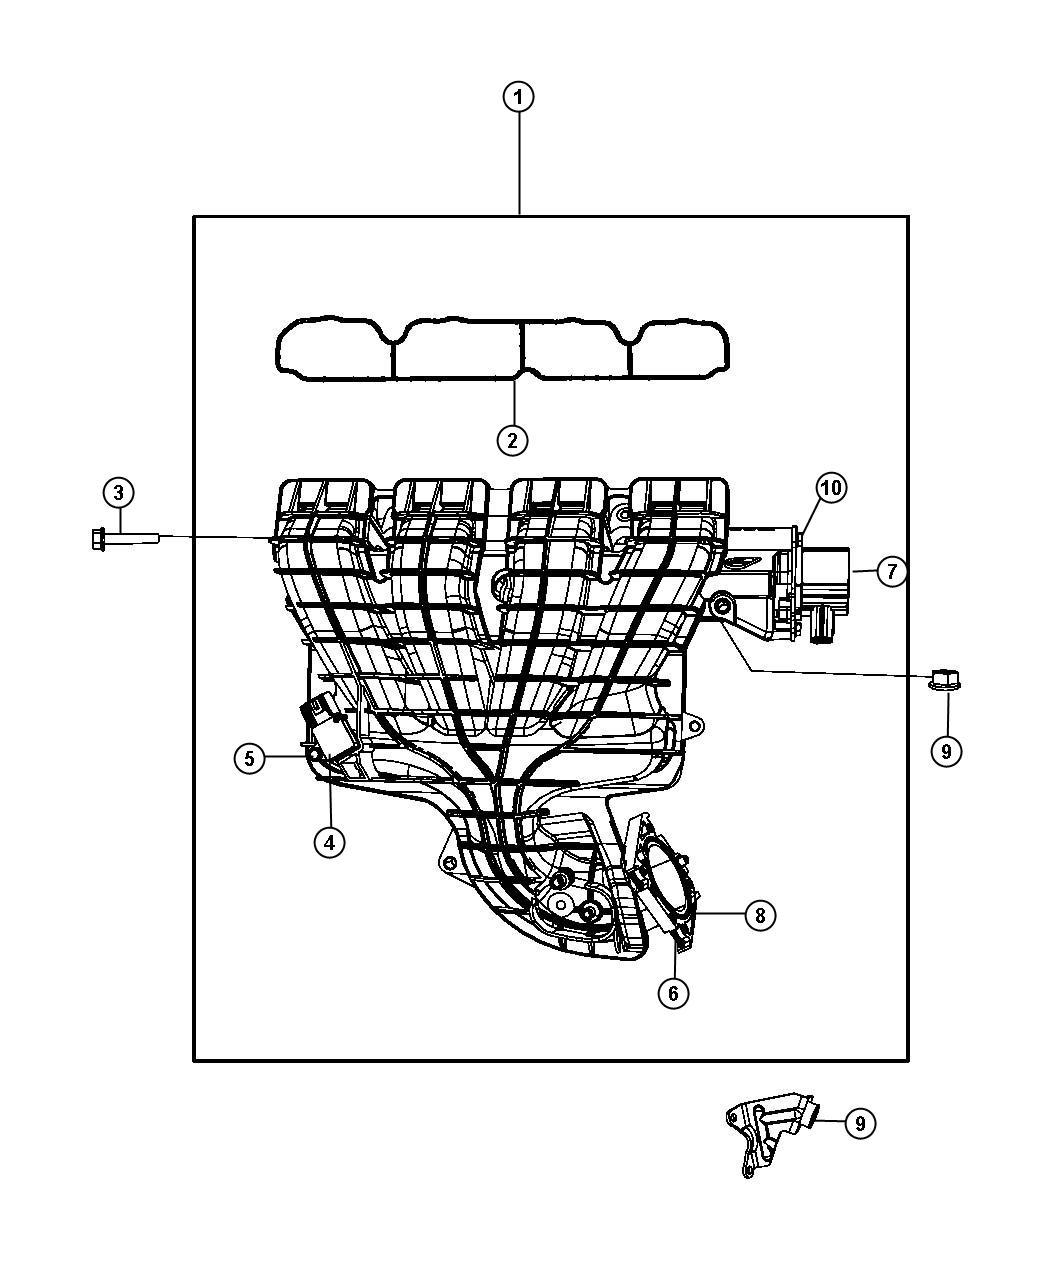 2008 Dodge Avenger 2 4l Belt Diagram Electrical Wiring Diagrams Engine Diy Enthusiasts U2022 Pulleys